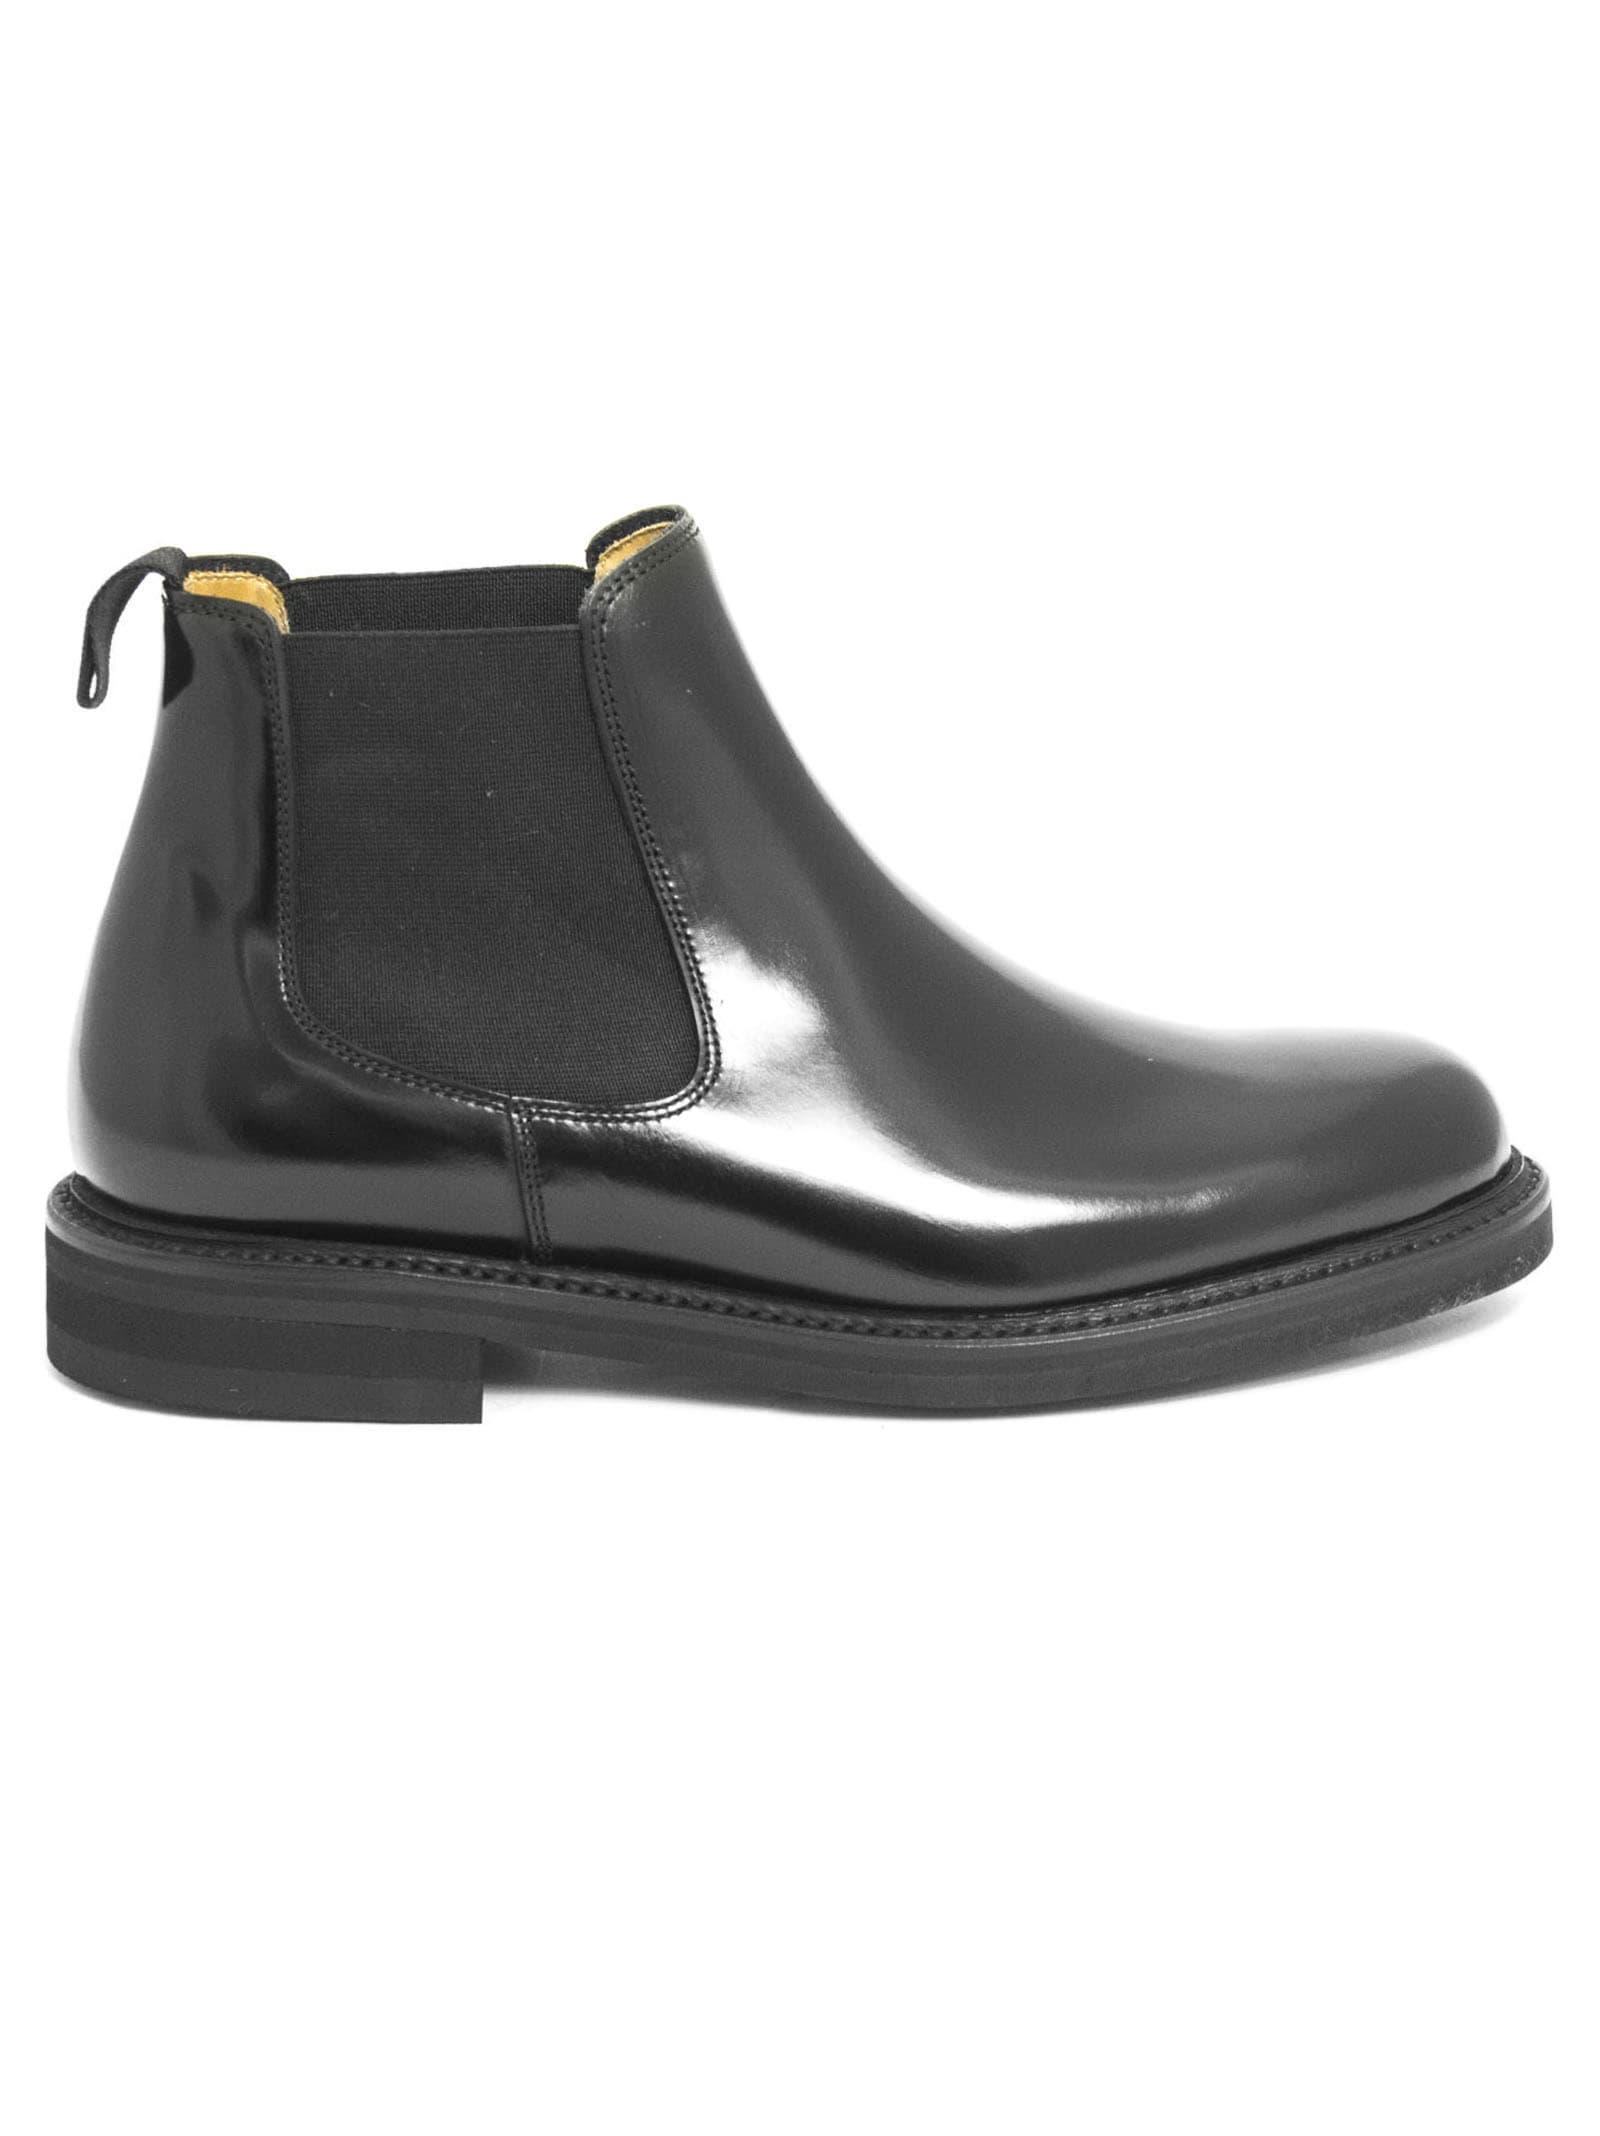 Berwick 1707 Black Leather Boots